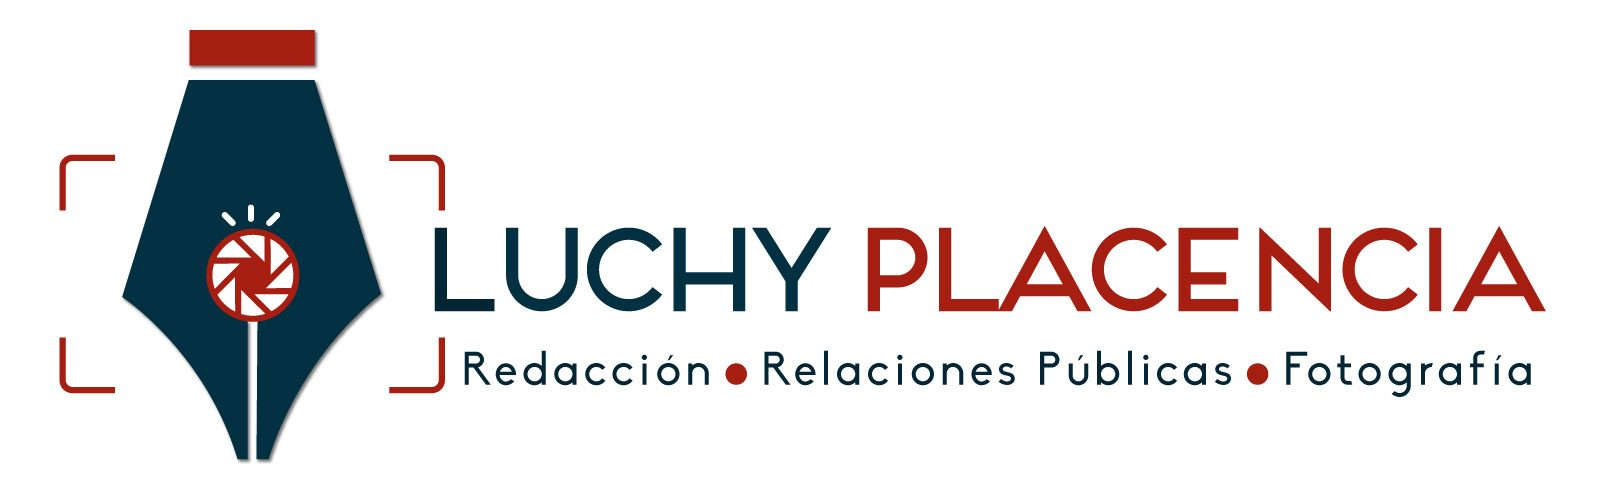 Luchy Placencia